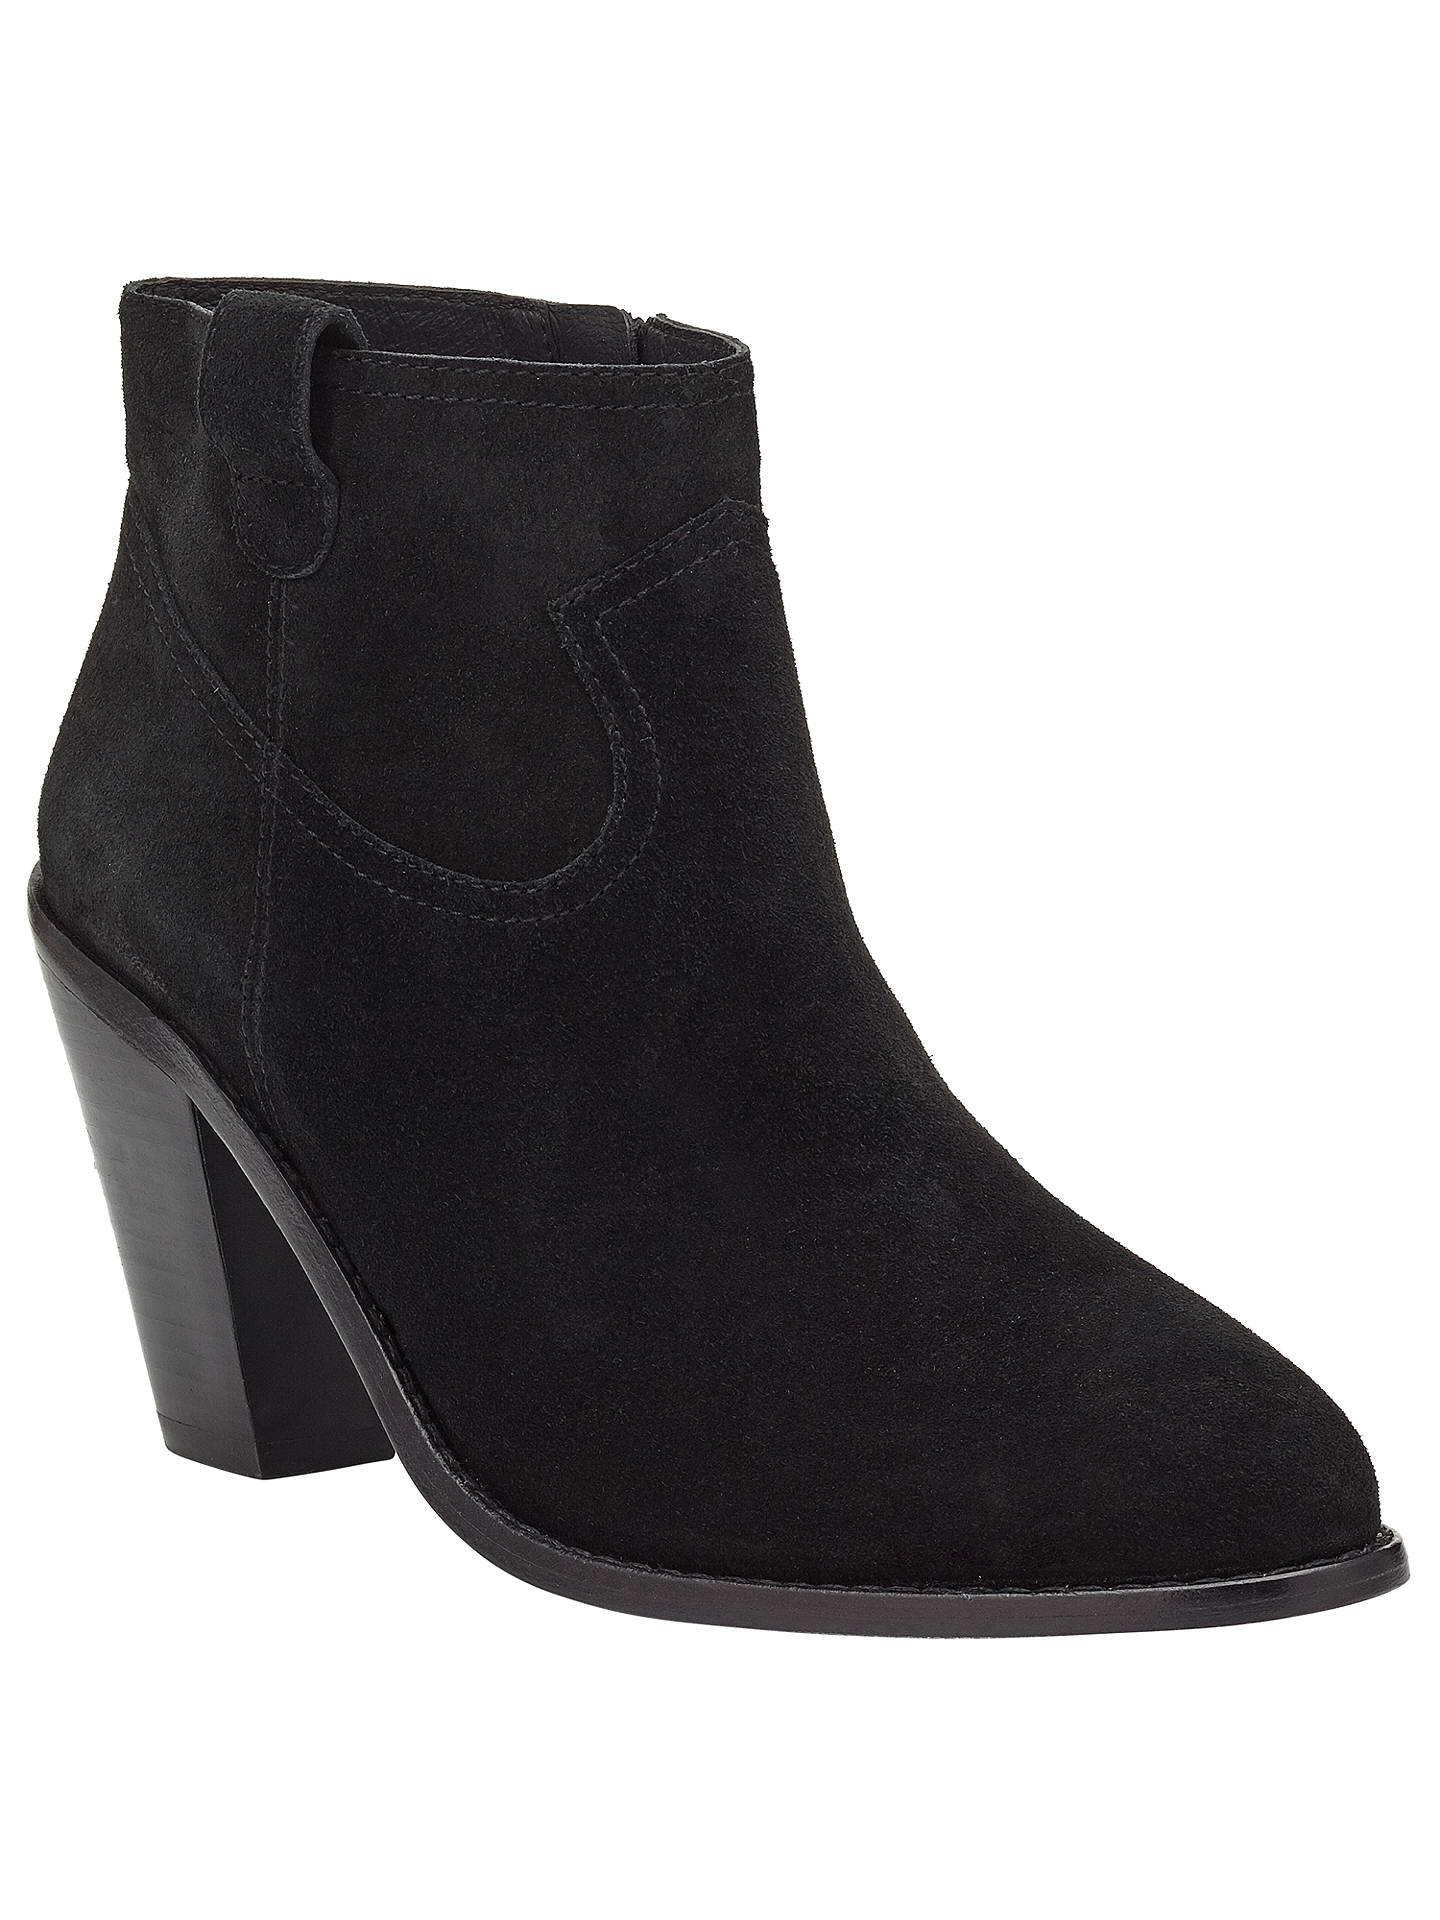 c85aec9b6ee Ash Ivana Heeled Ankle Boots, Black at John Lewis & Partners